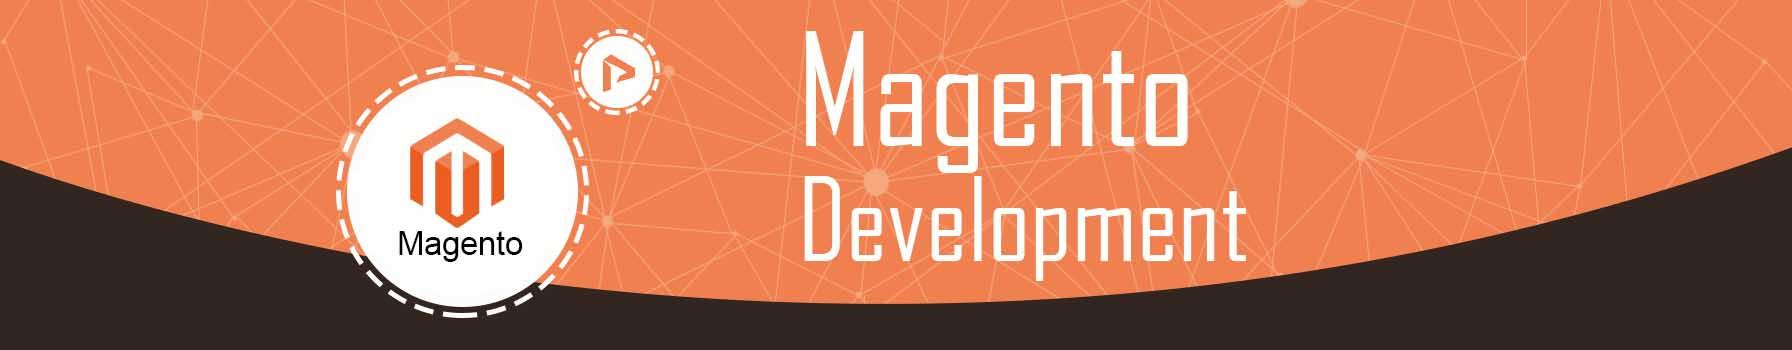 magento-development.jpg